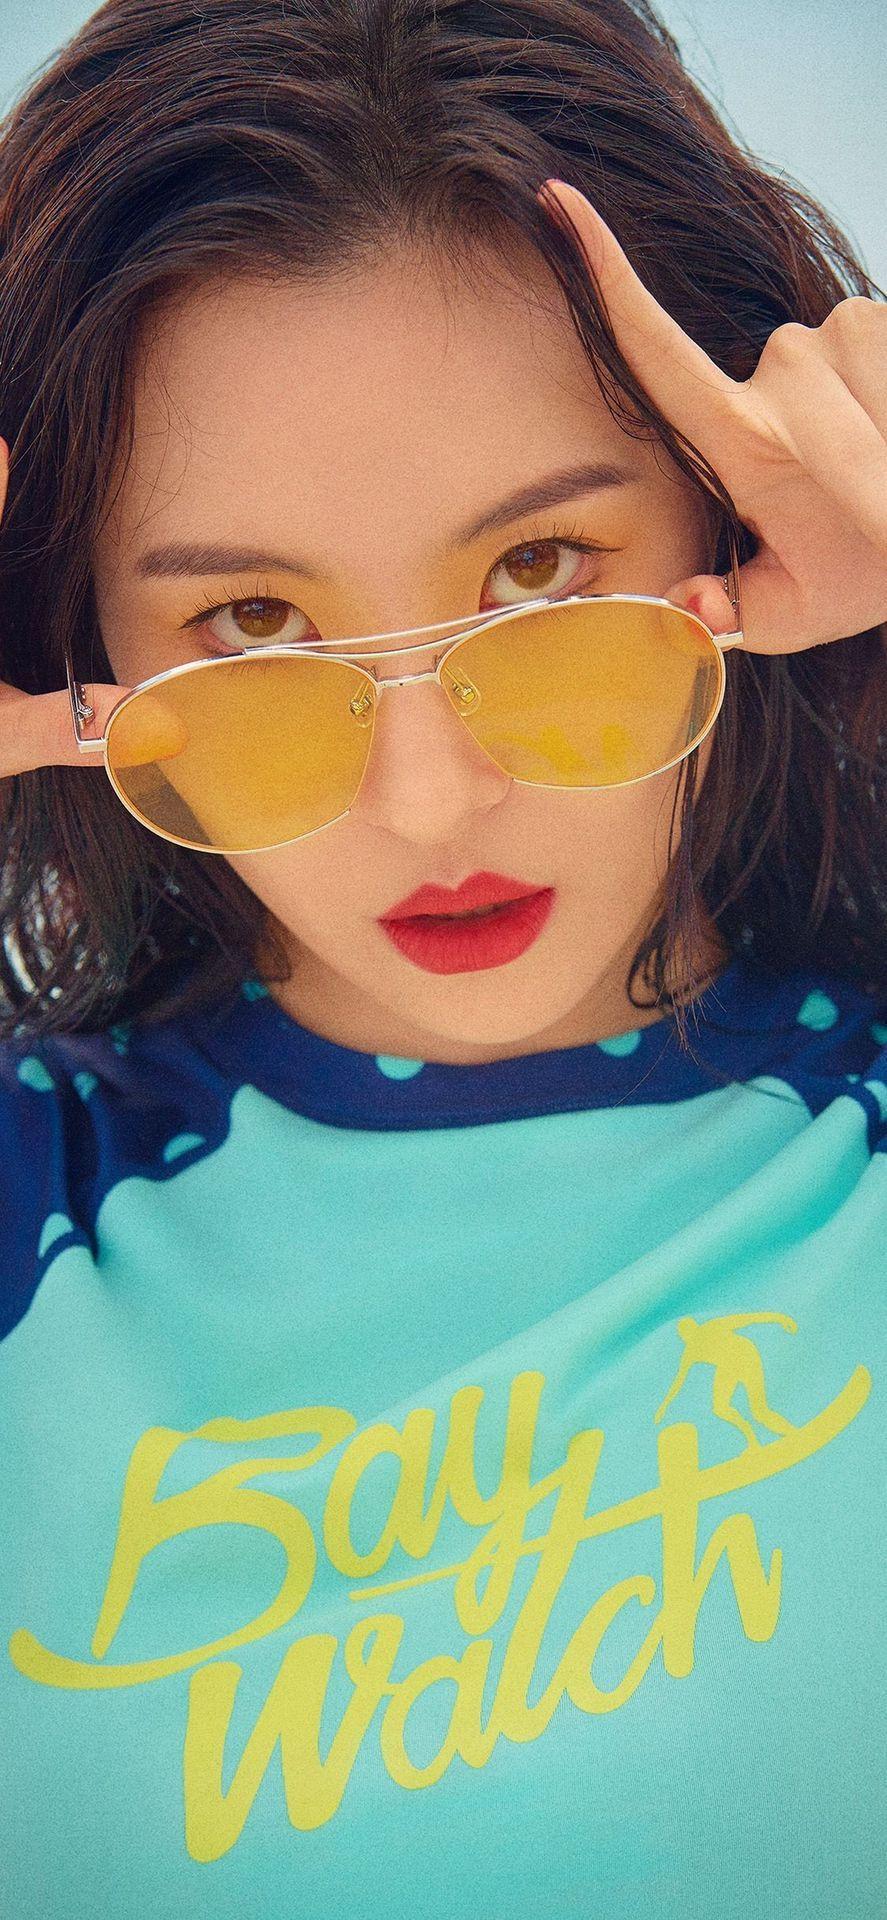 [Góc Xả Ảnh] Xả ảnh idol Kpop |Female|